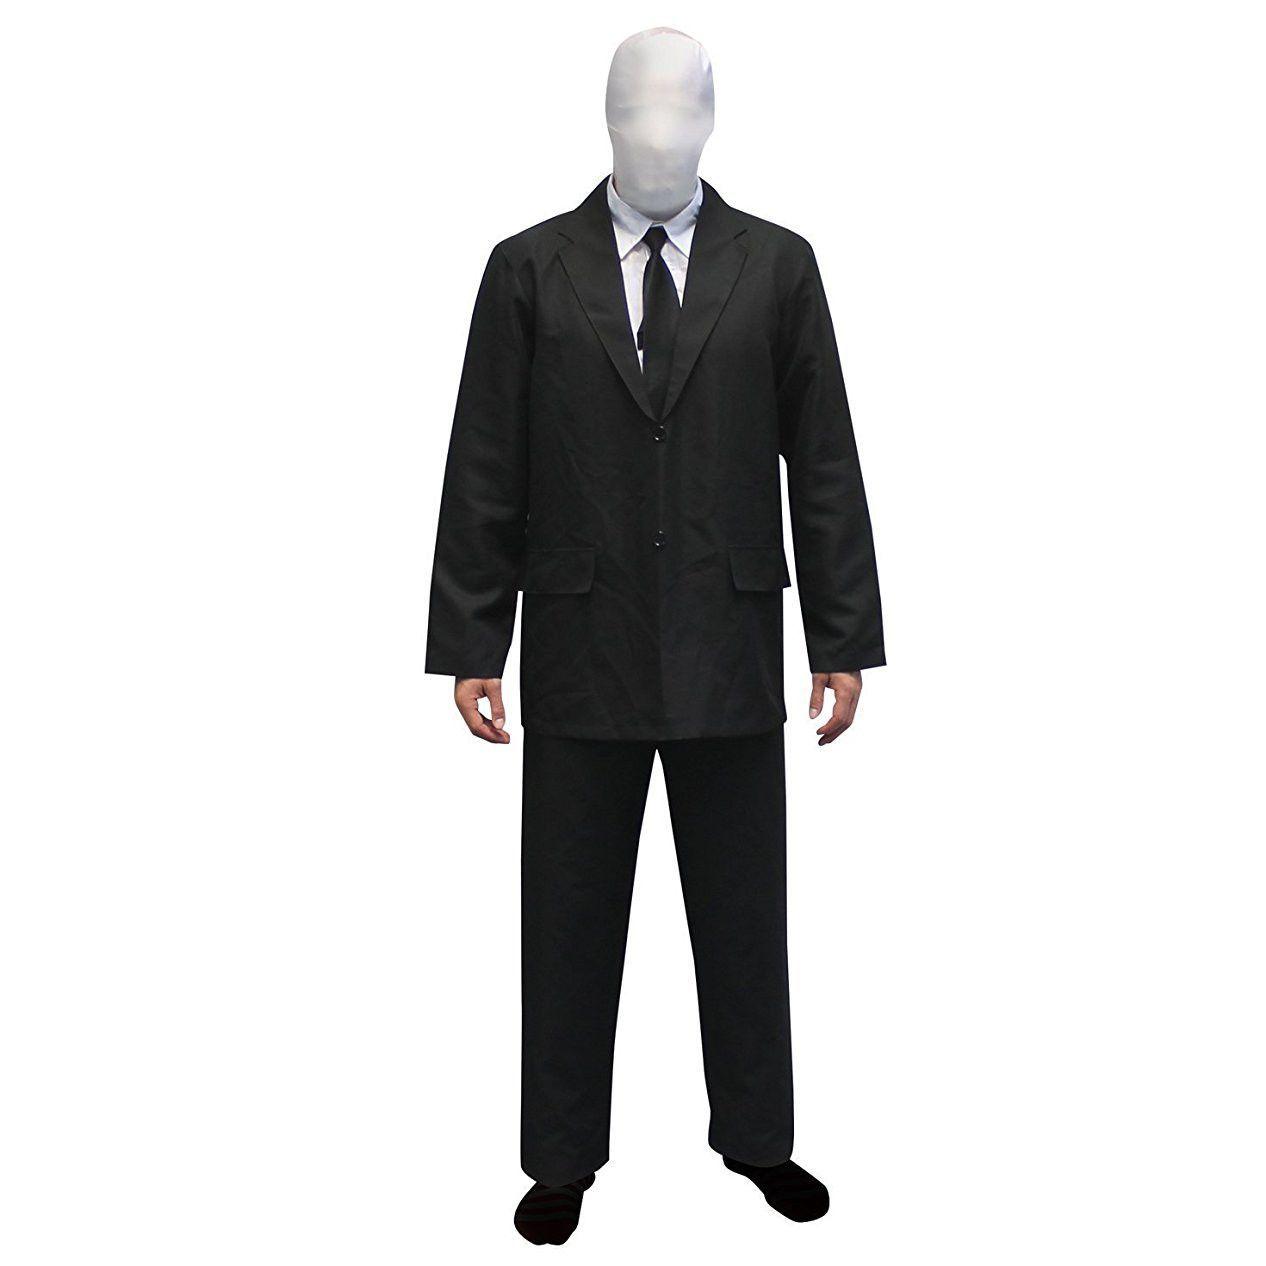 slenderman adult costume morphsuit | top halloween costumes